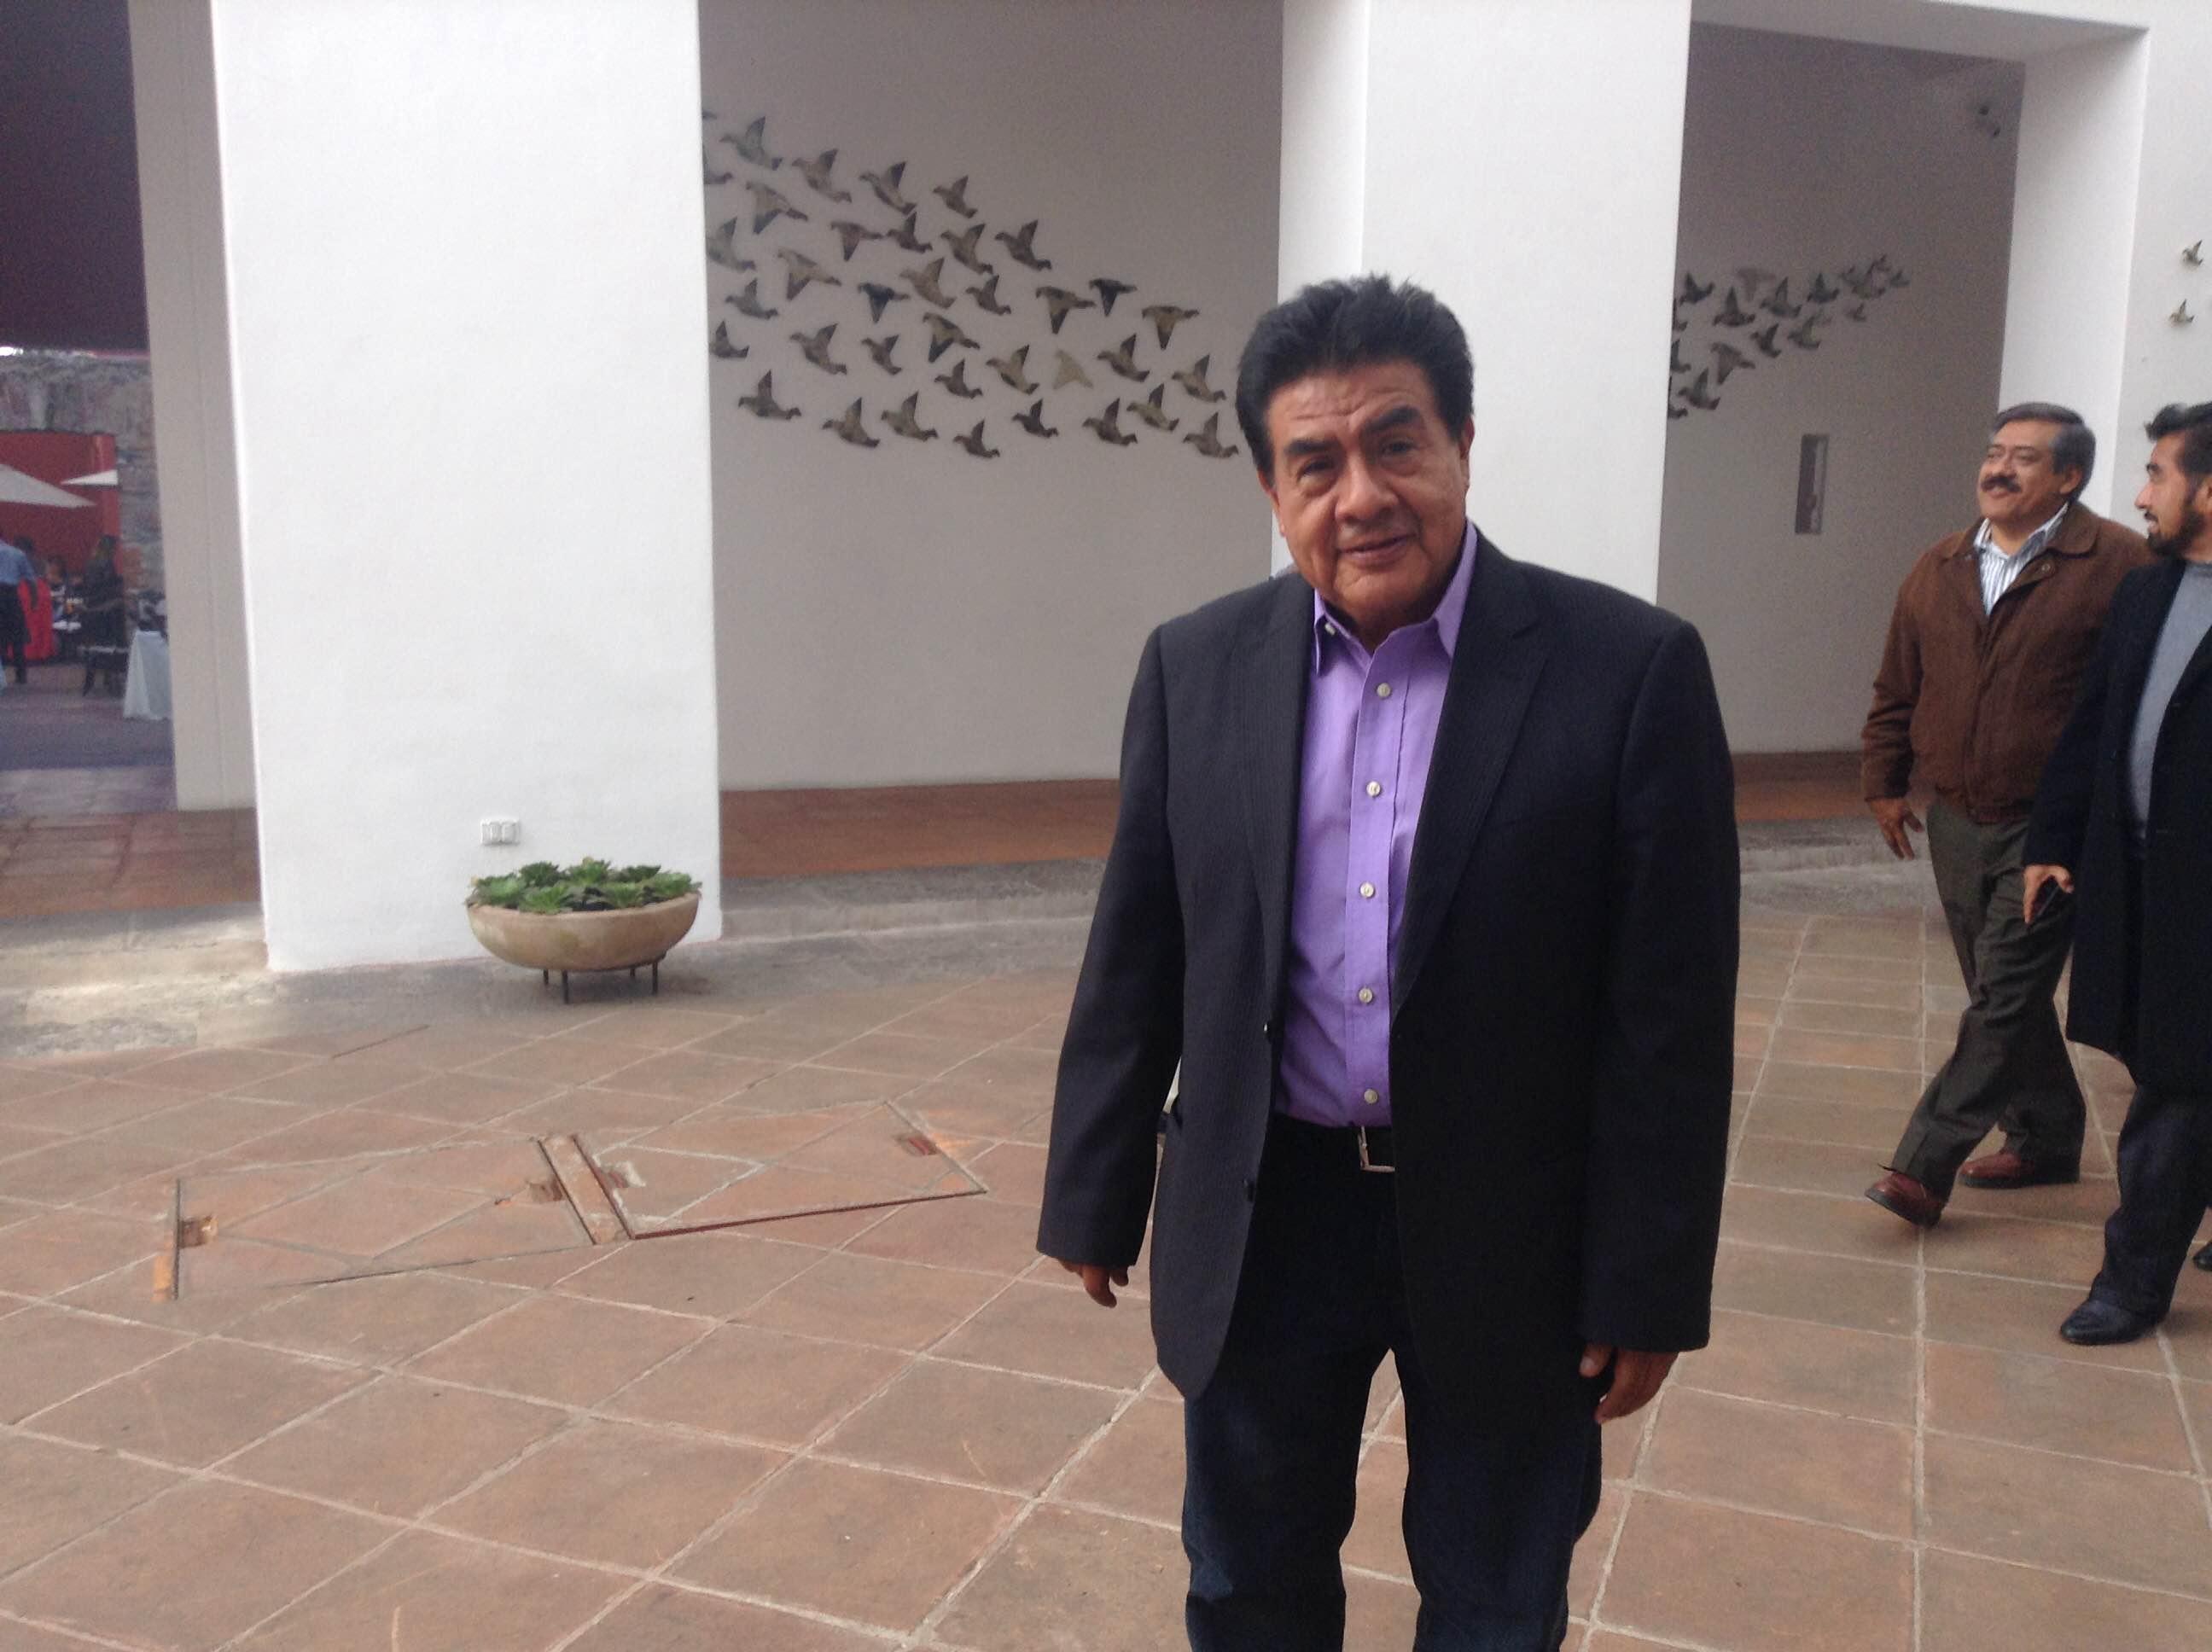 Sitracobp es el titular del CCT en Bachilleres, asevera Ordaz Pérez